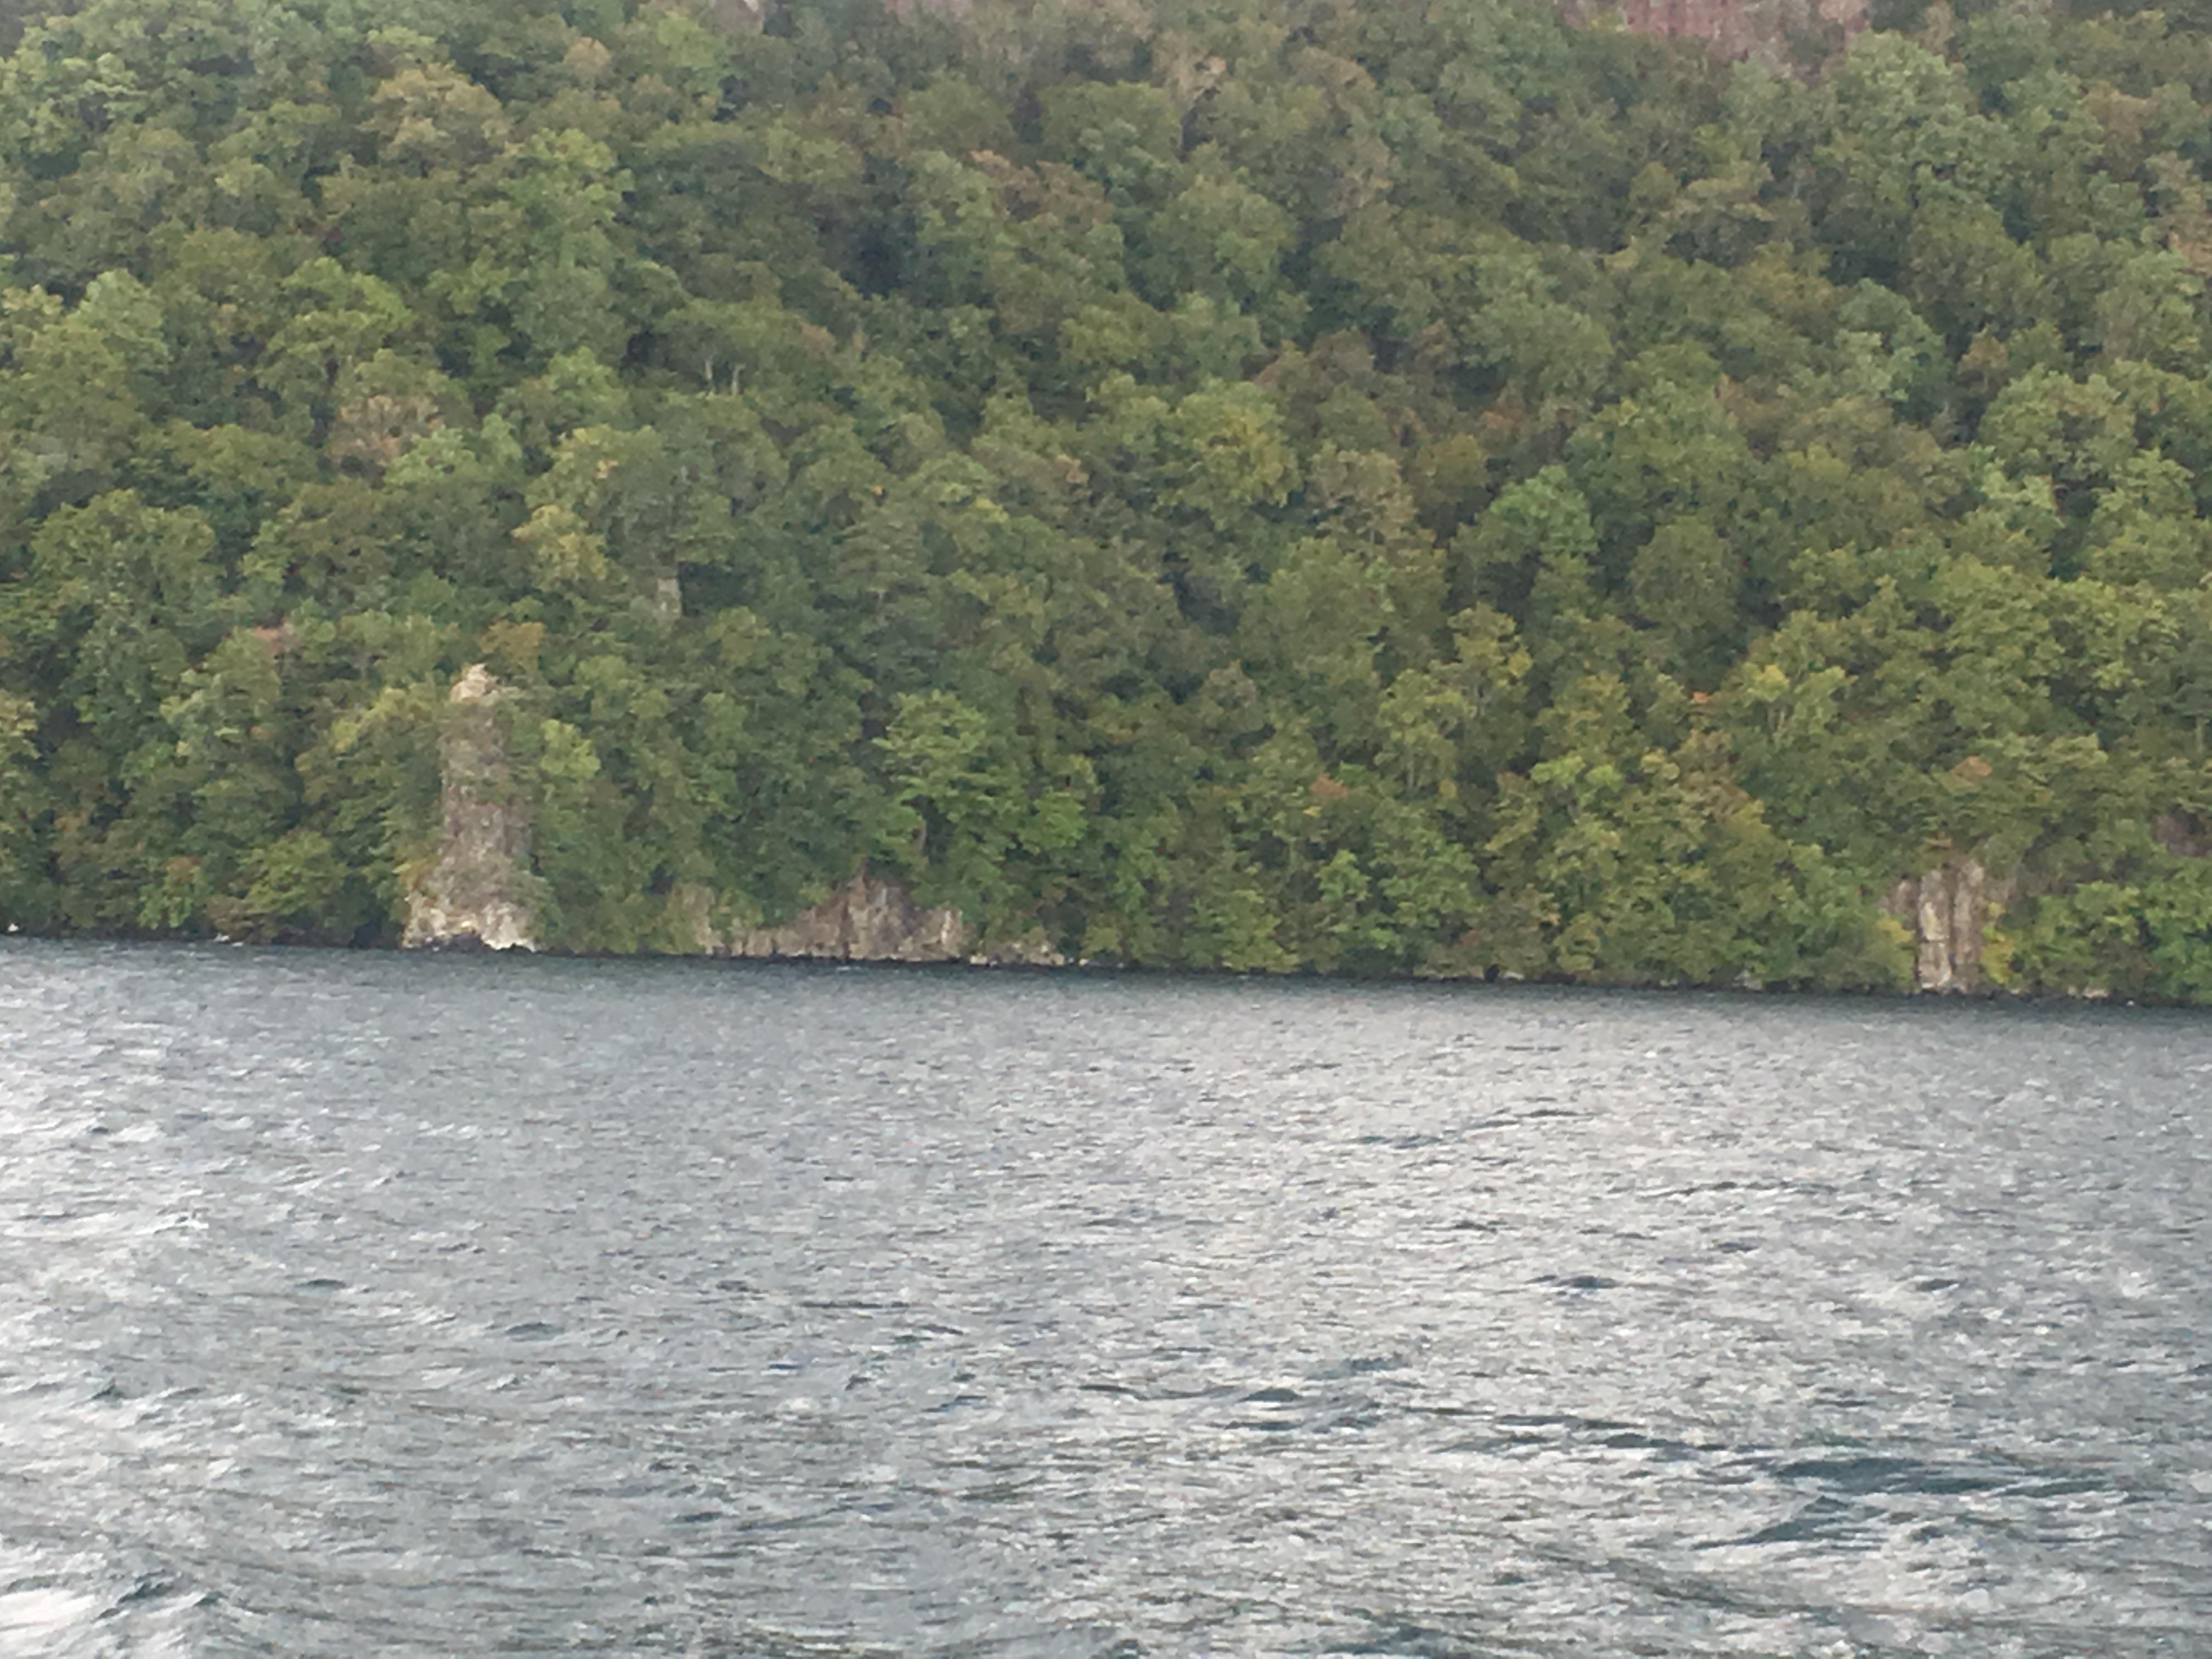 十和田湖遊覧船船首から御倉半島